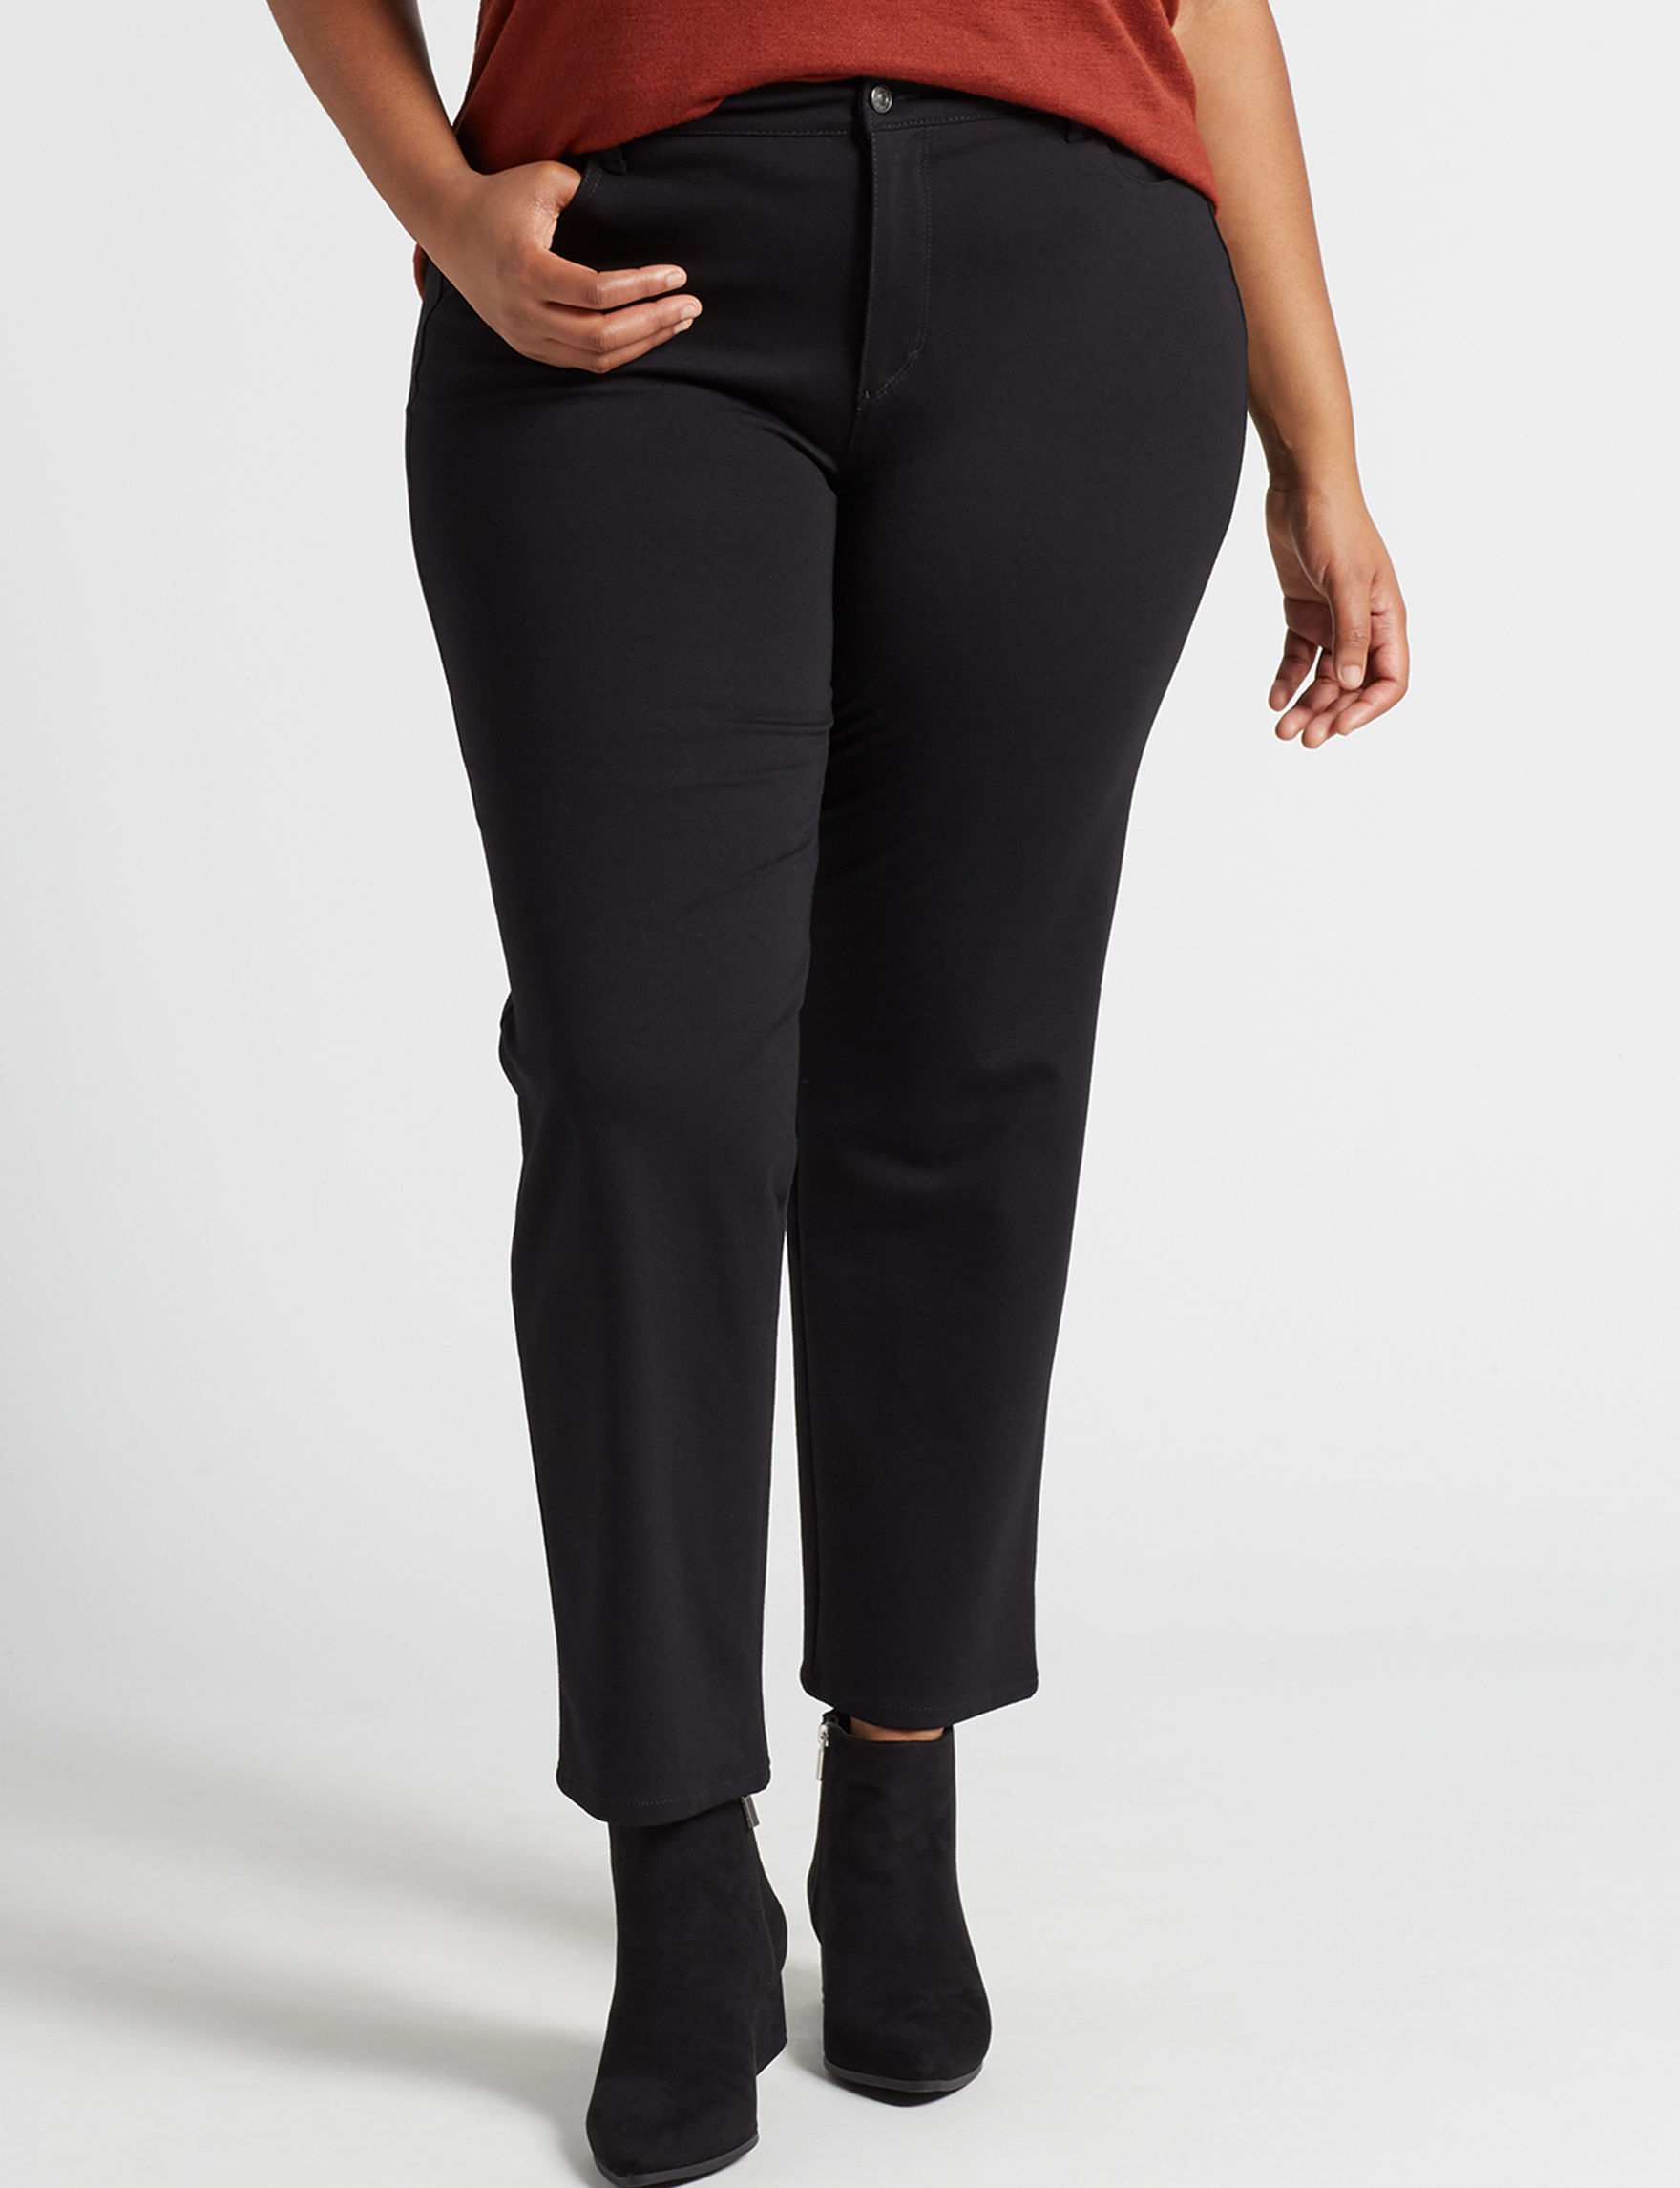 Gloria Vanderbilt Black Soft Pants